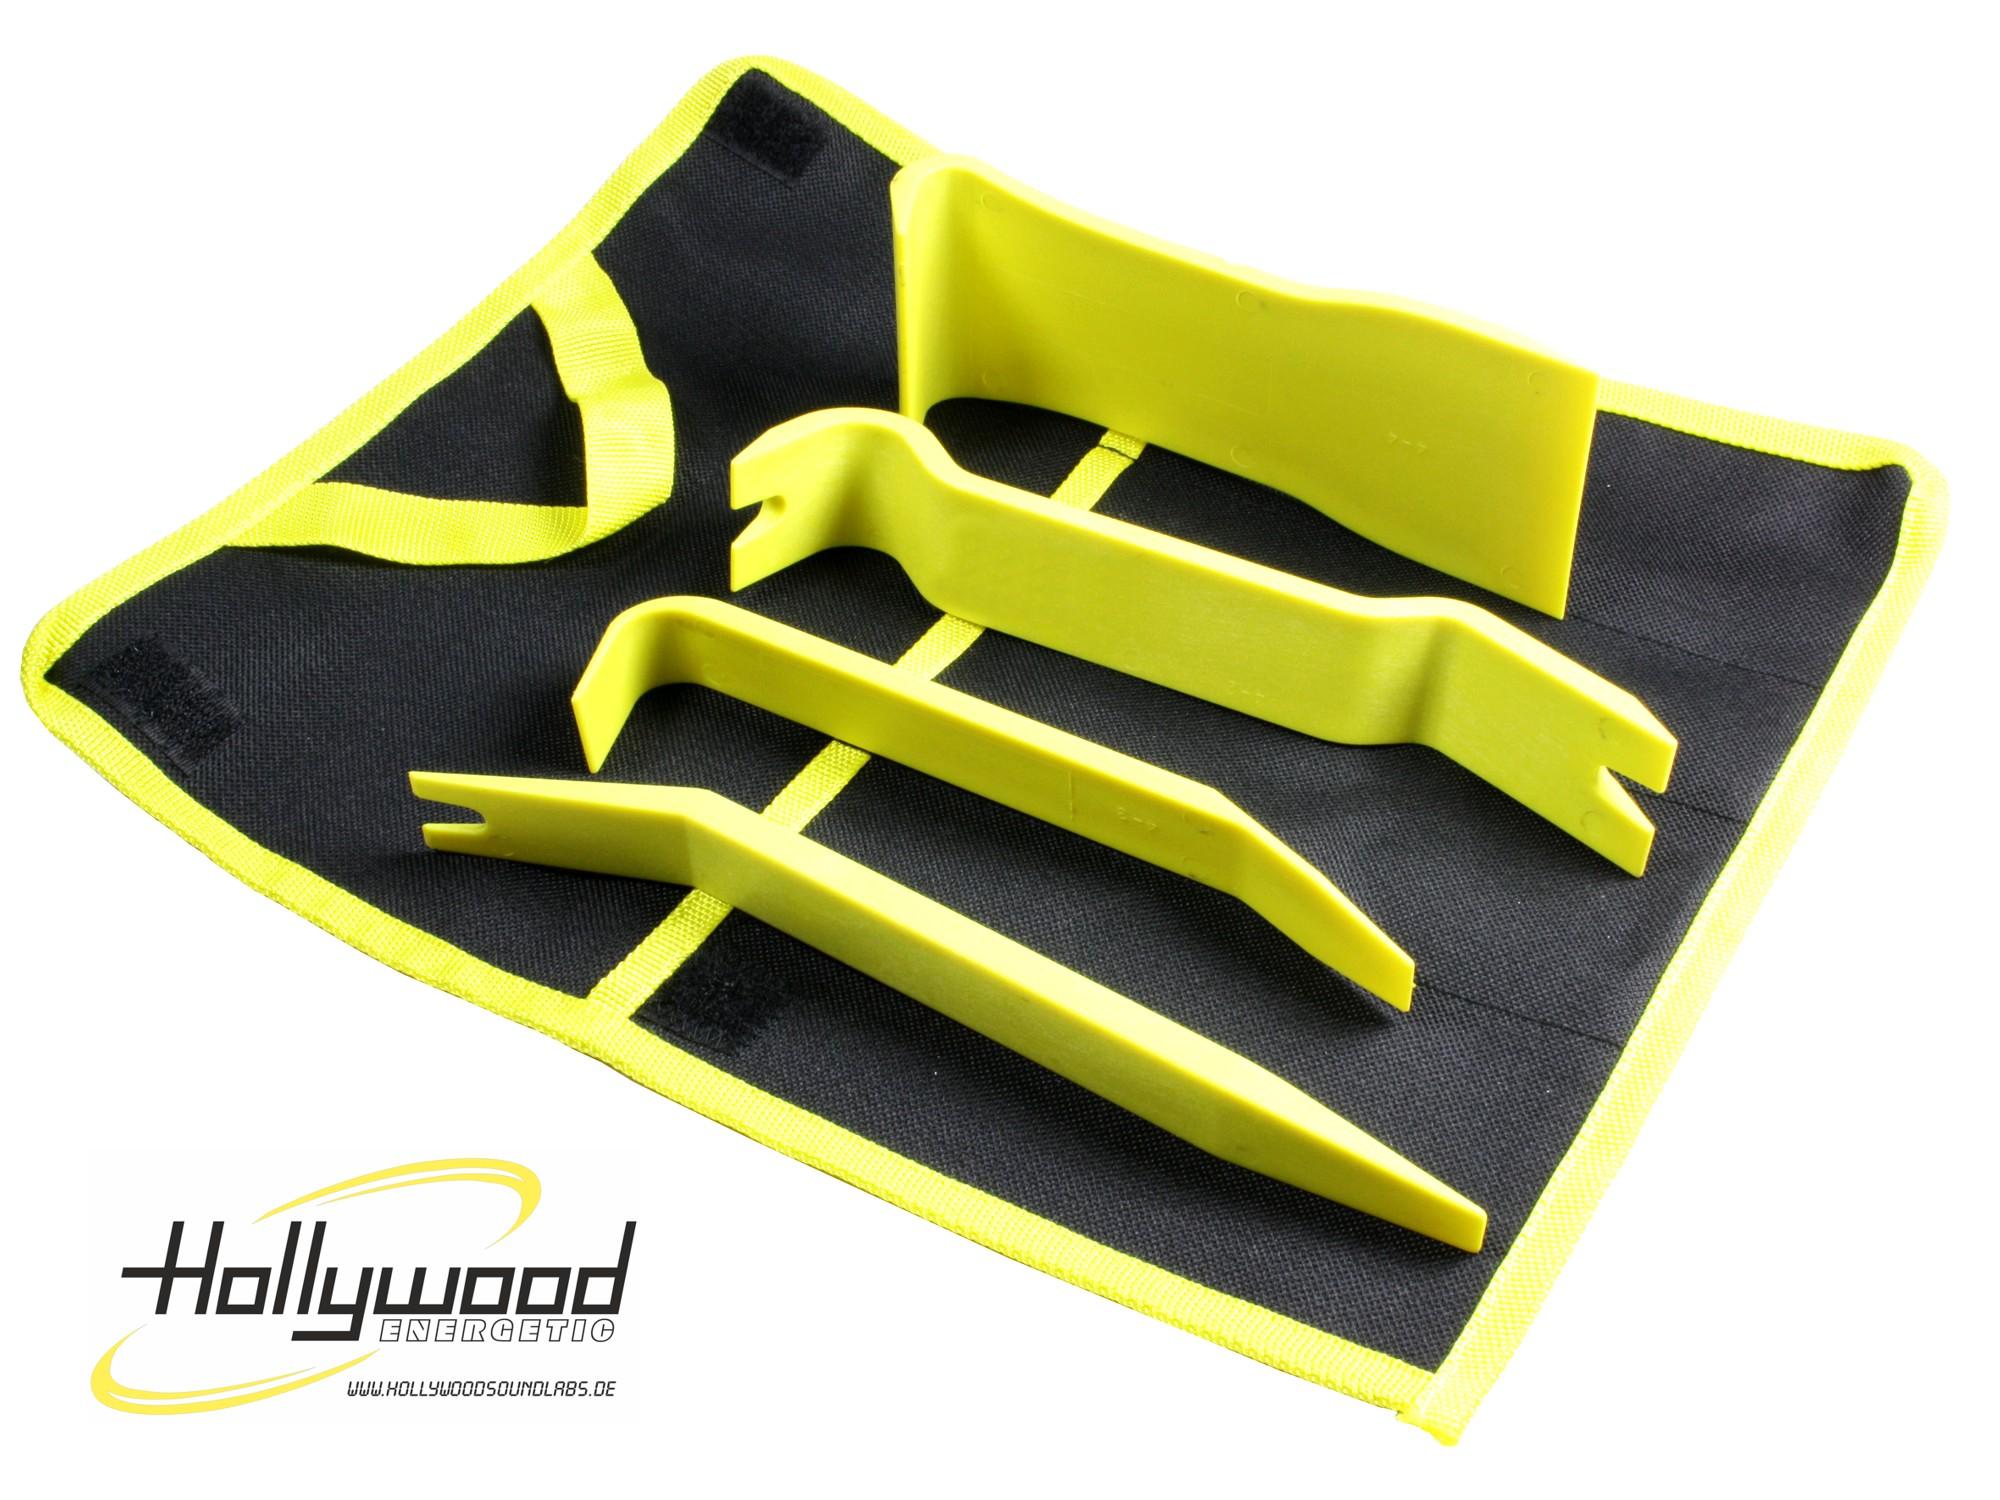 Hollywood tool set